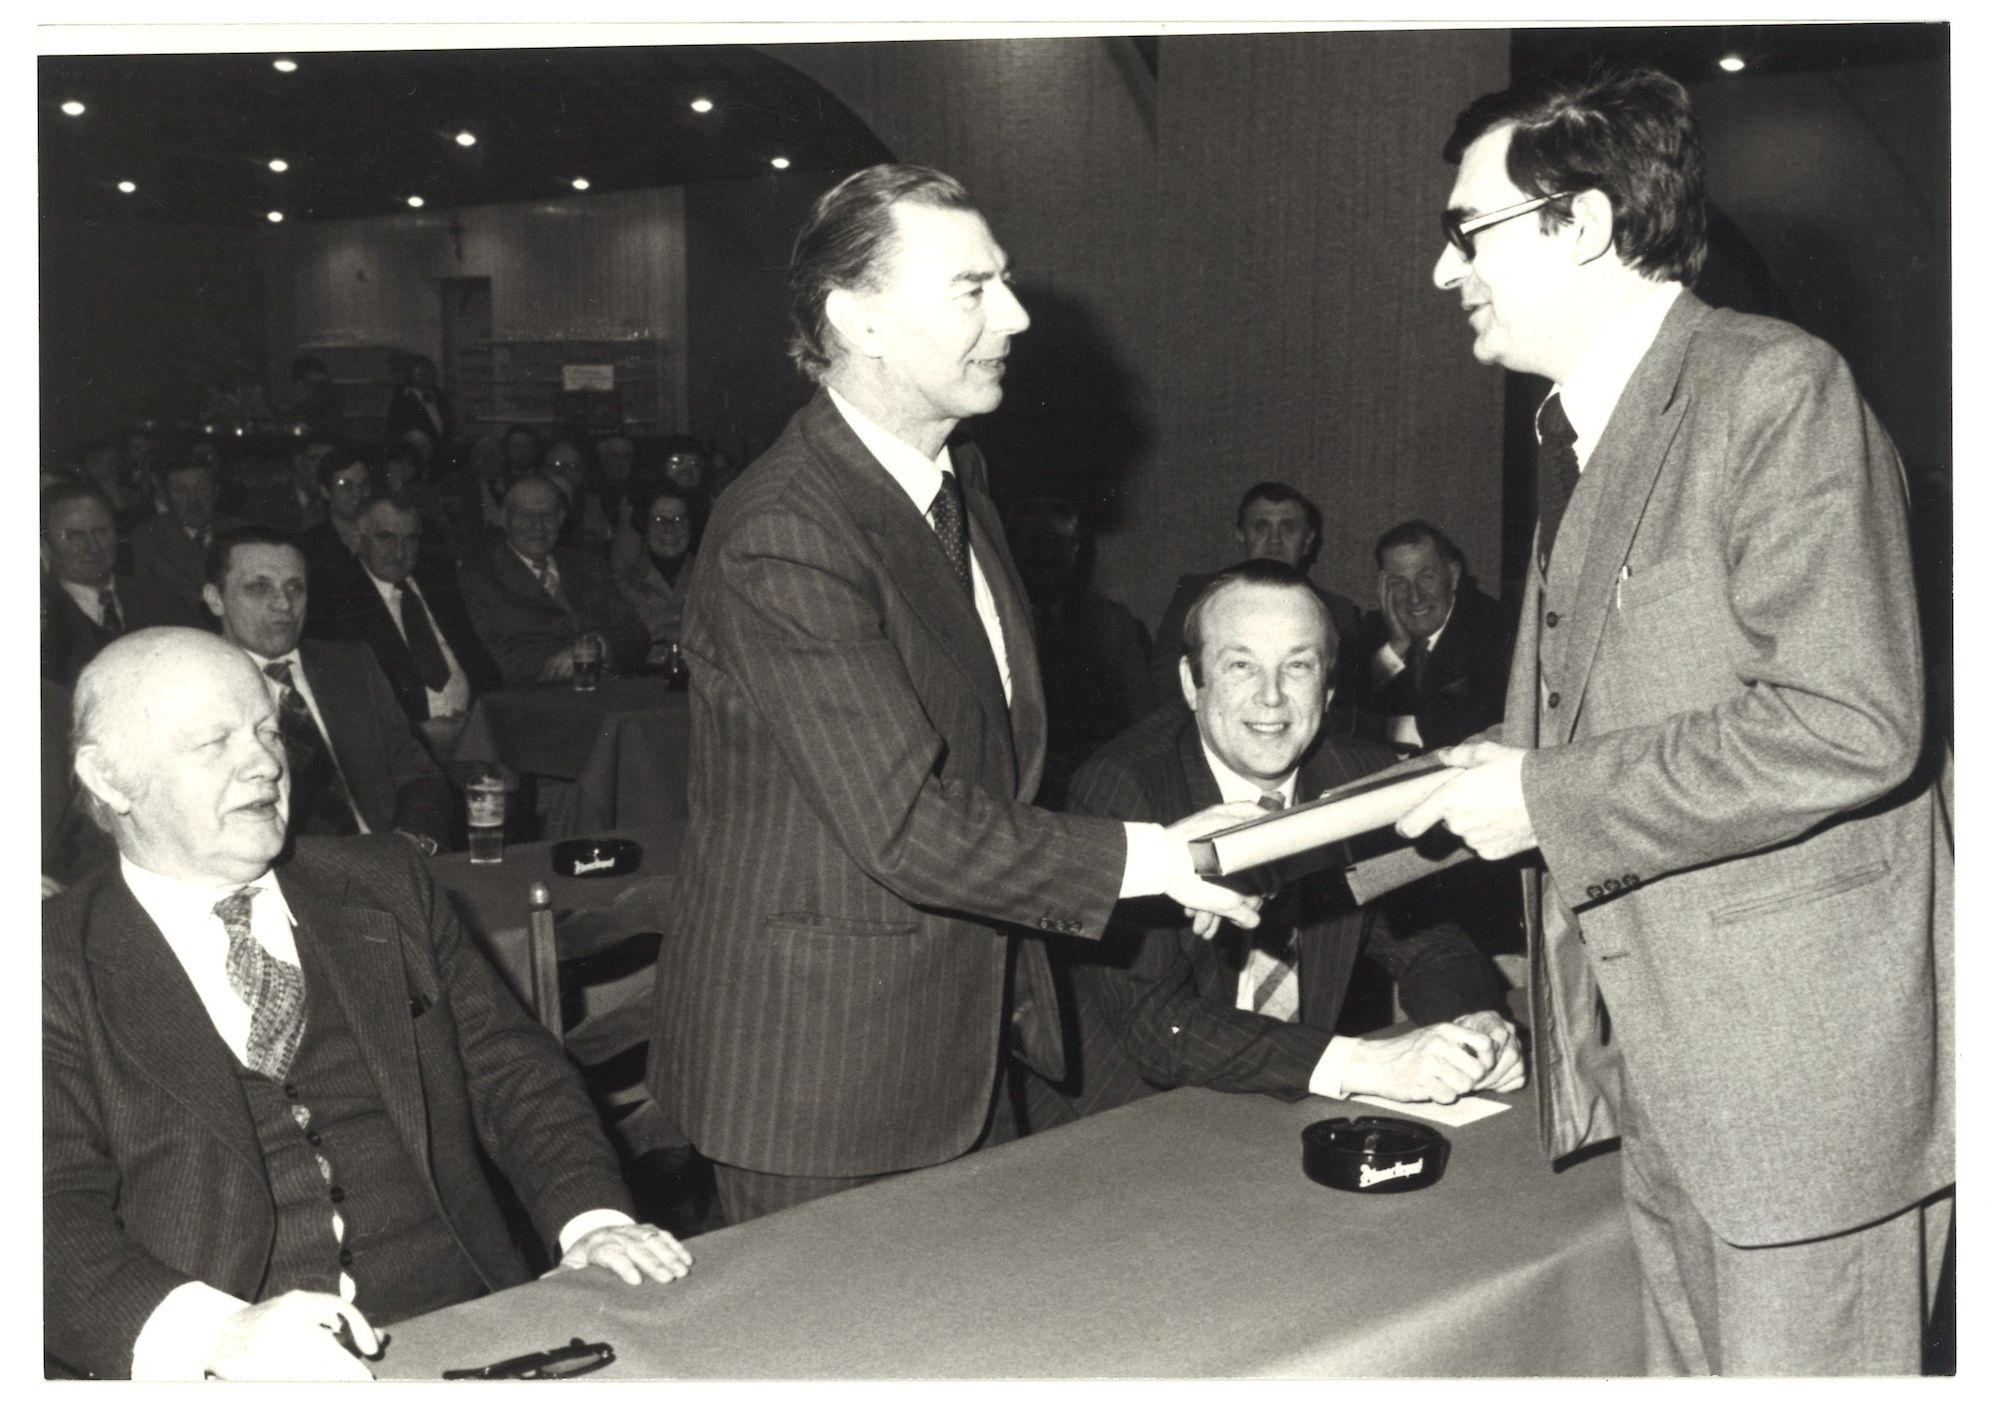 Minister Leo Tindemans